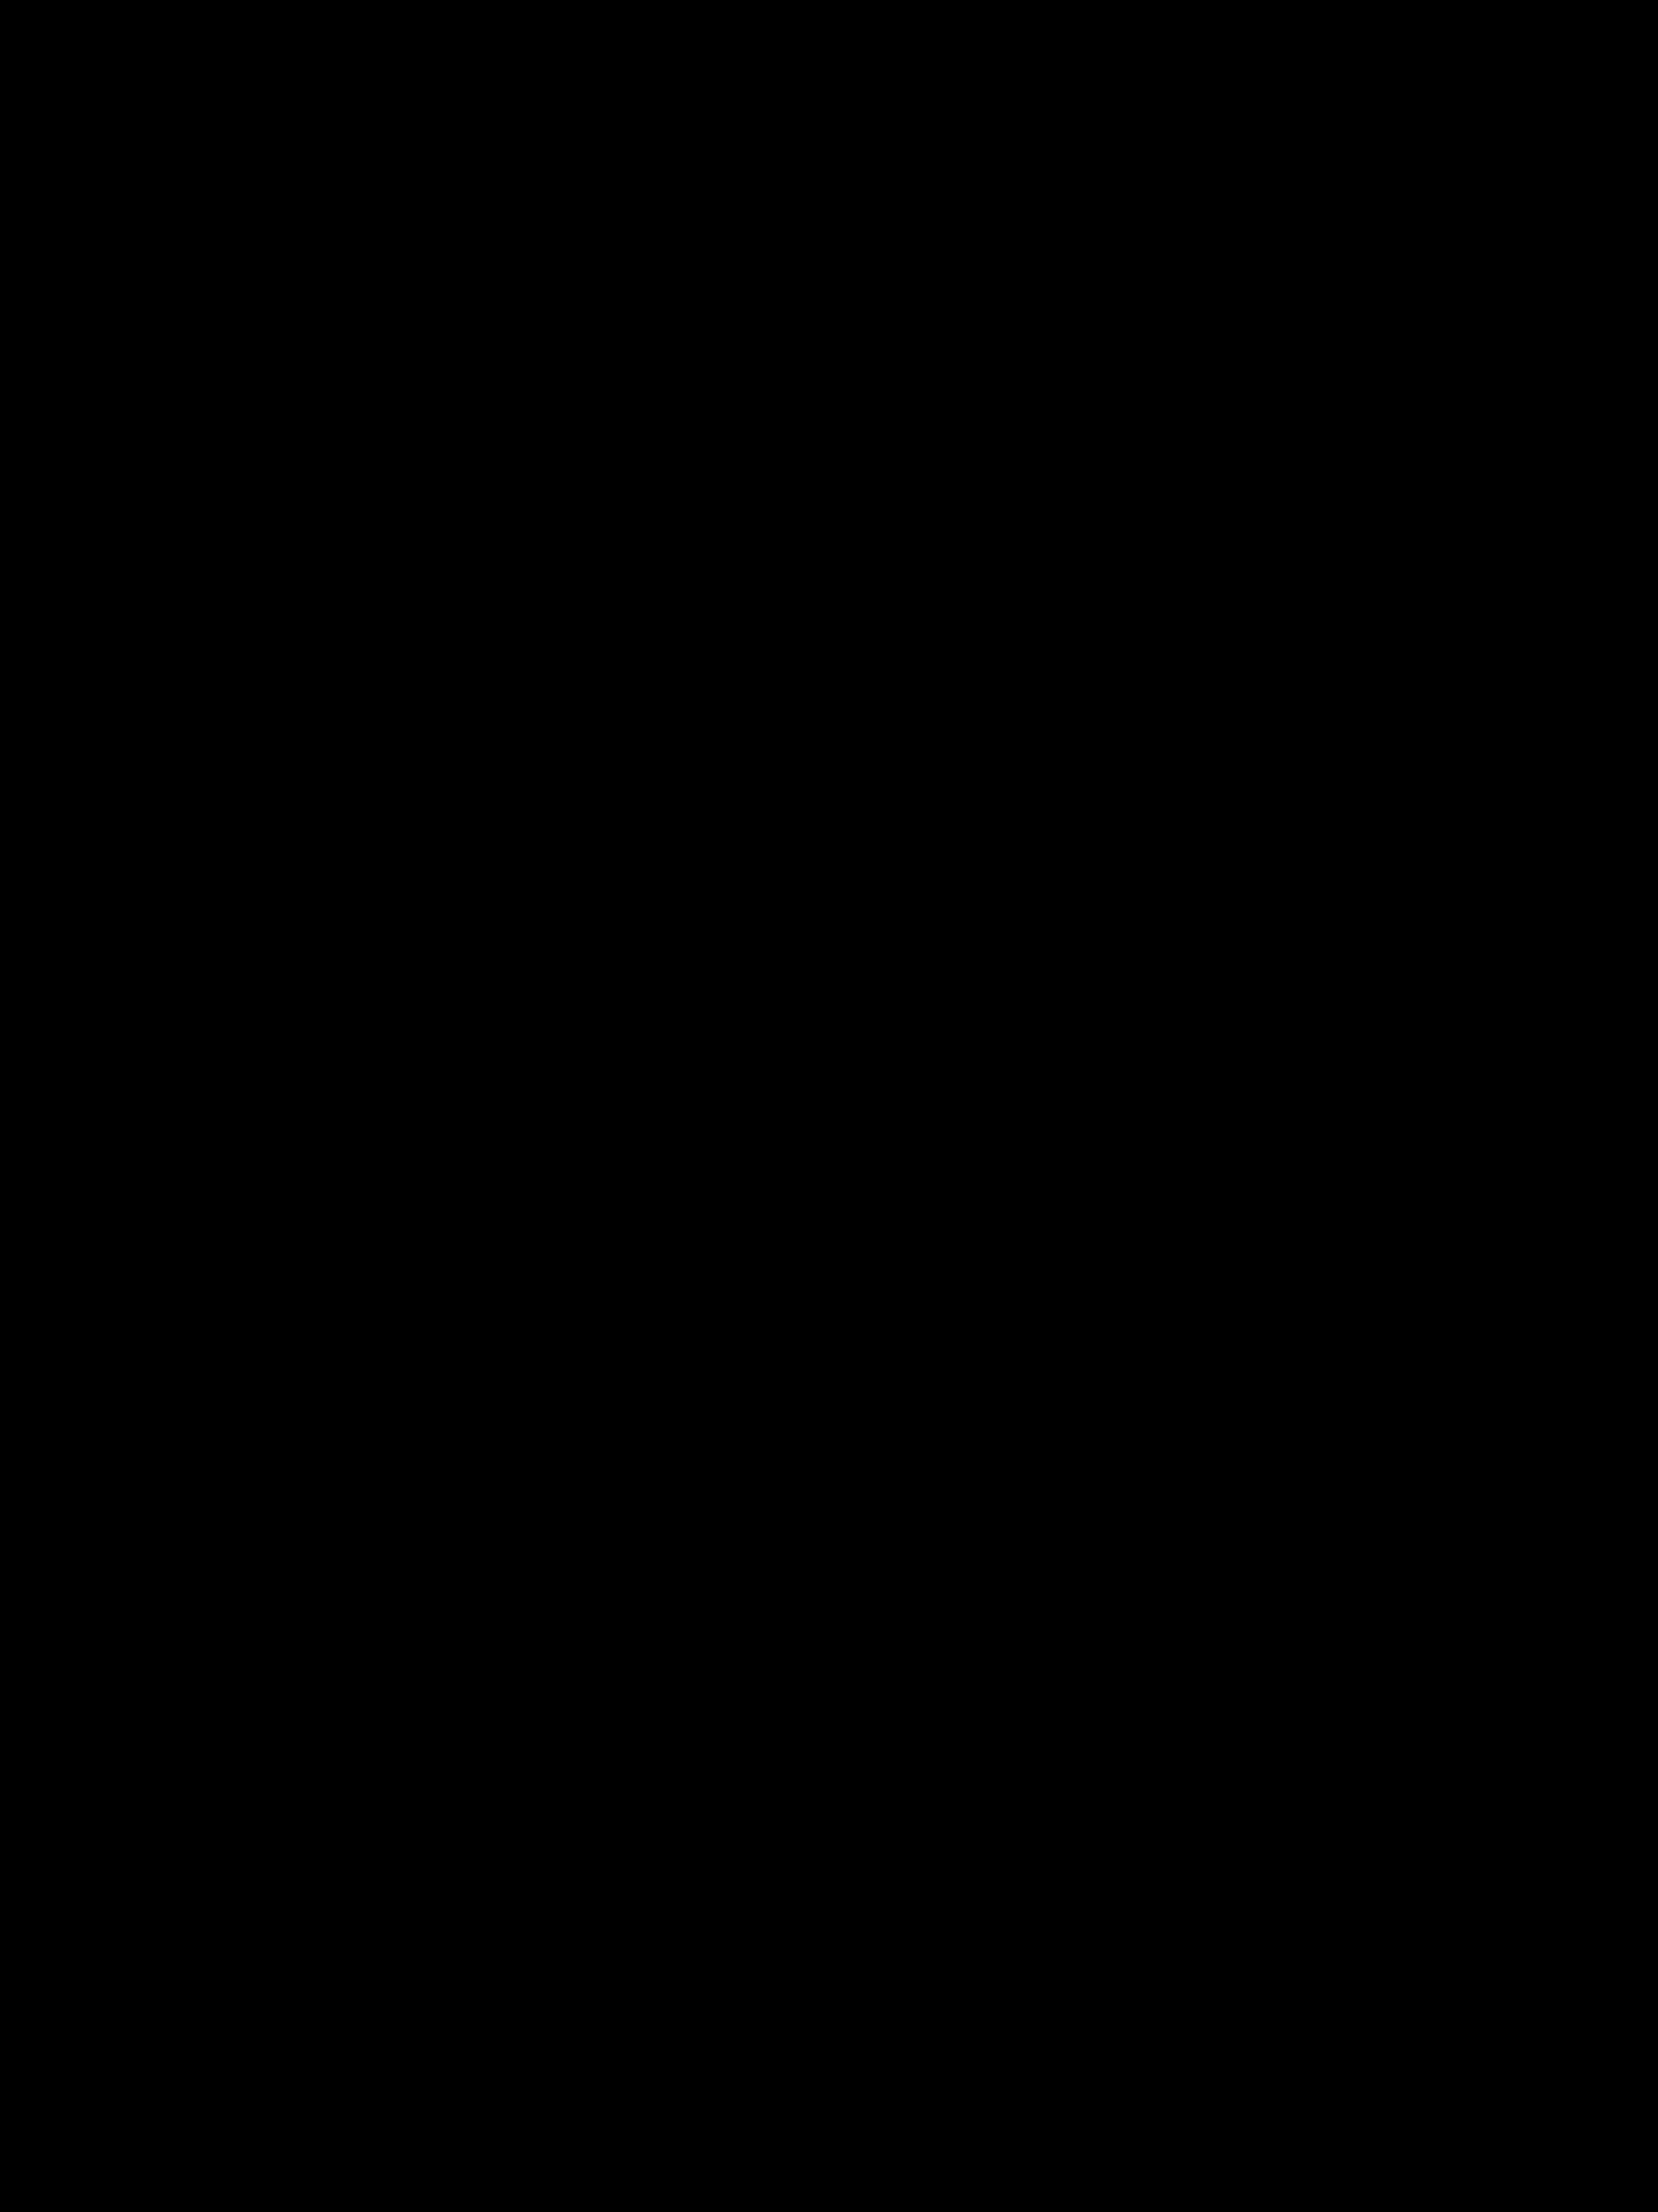 Follow 3 3 . almeidapedro3 hawaiiantattoosdesigns